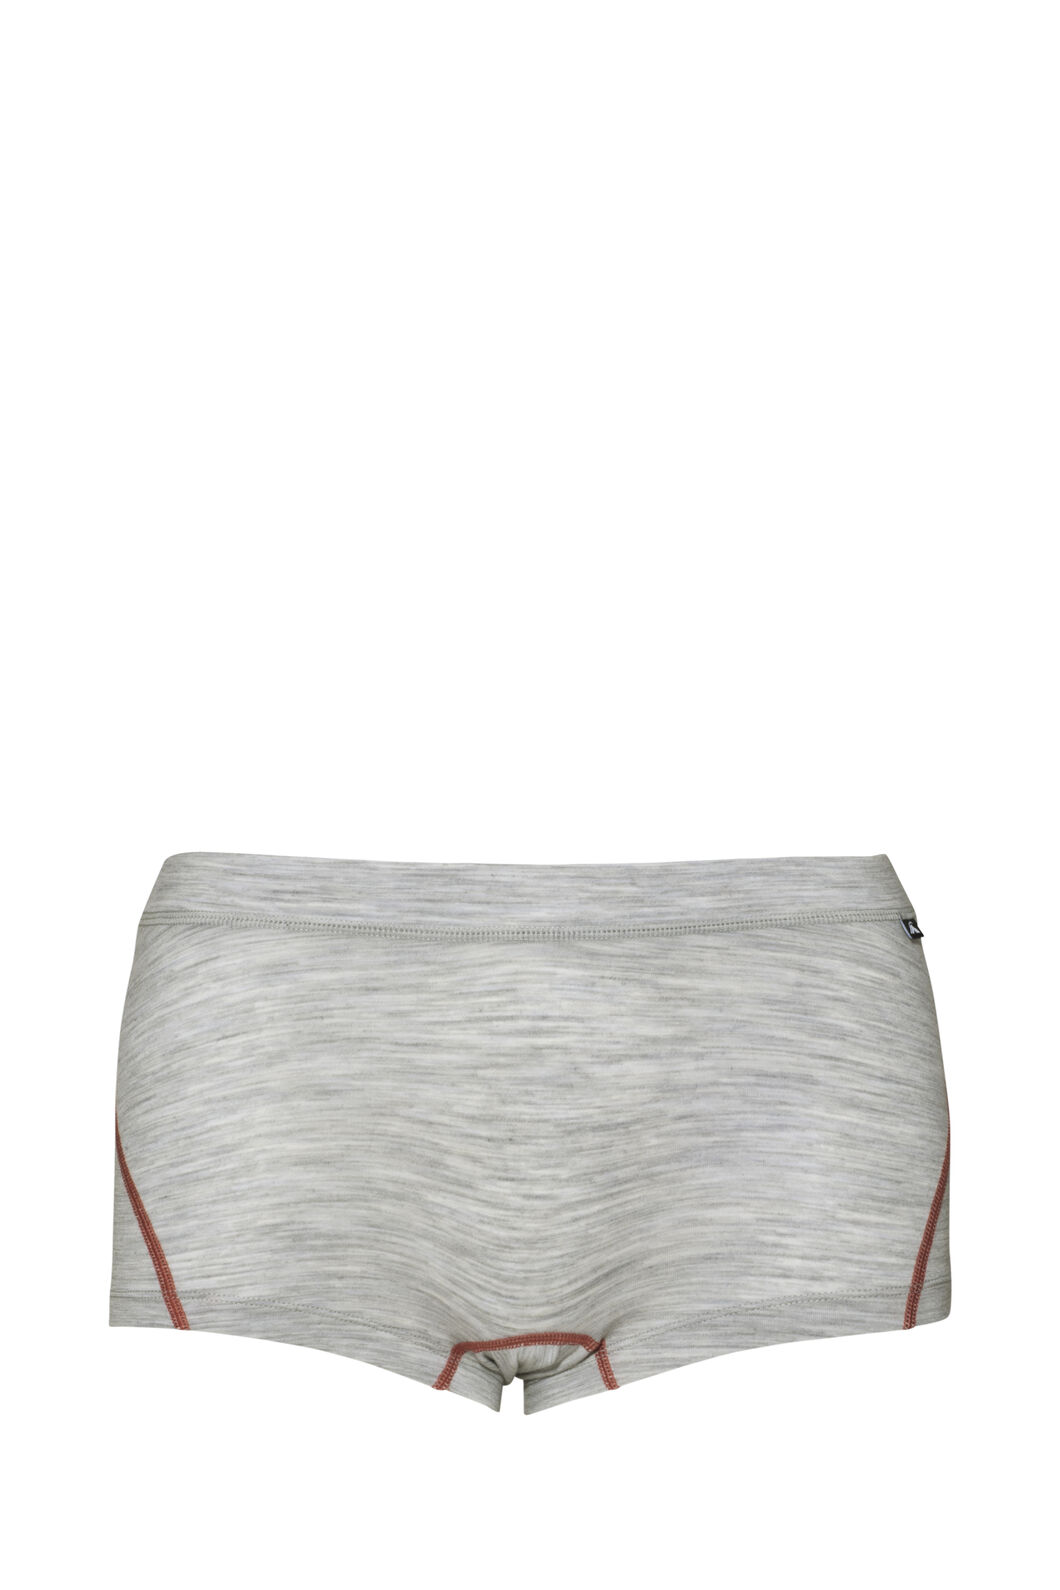 Macpac 180 Merino Boxers — Women's, Light Grey Marlel/Dusty Cedar, hi-res